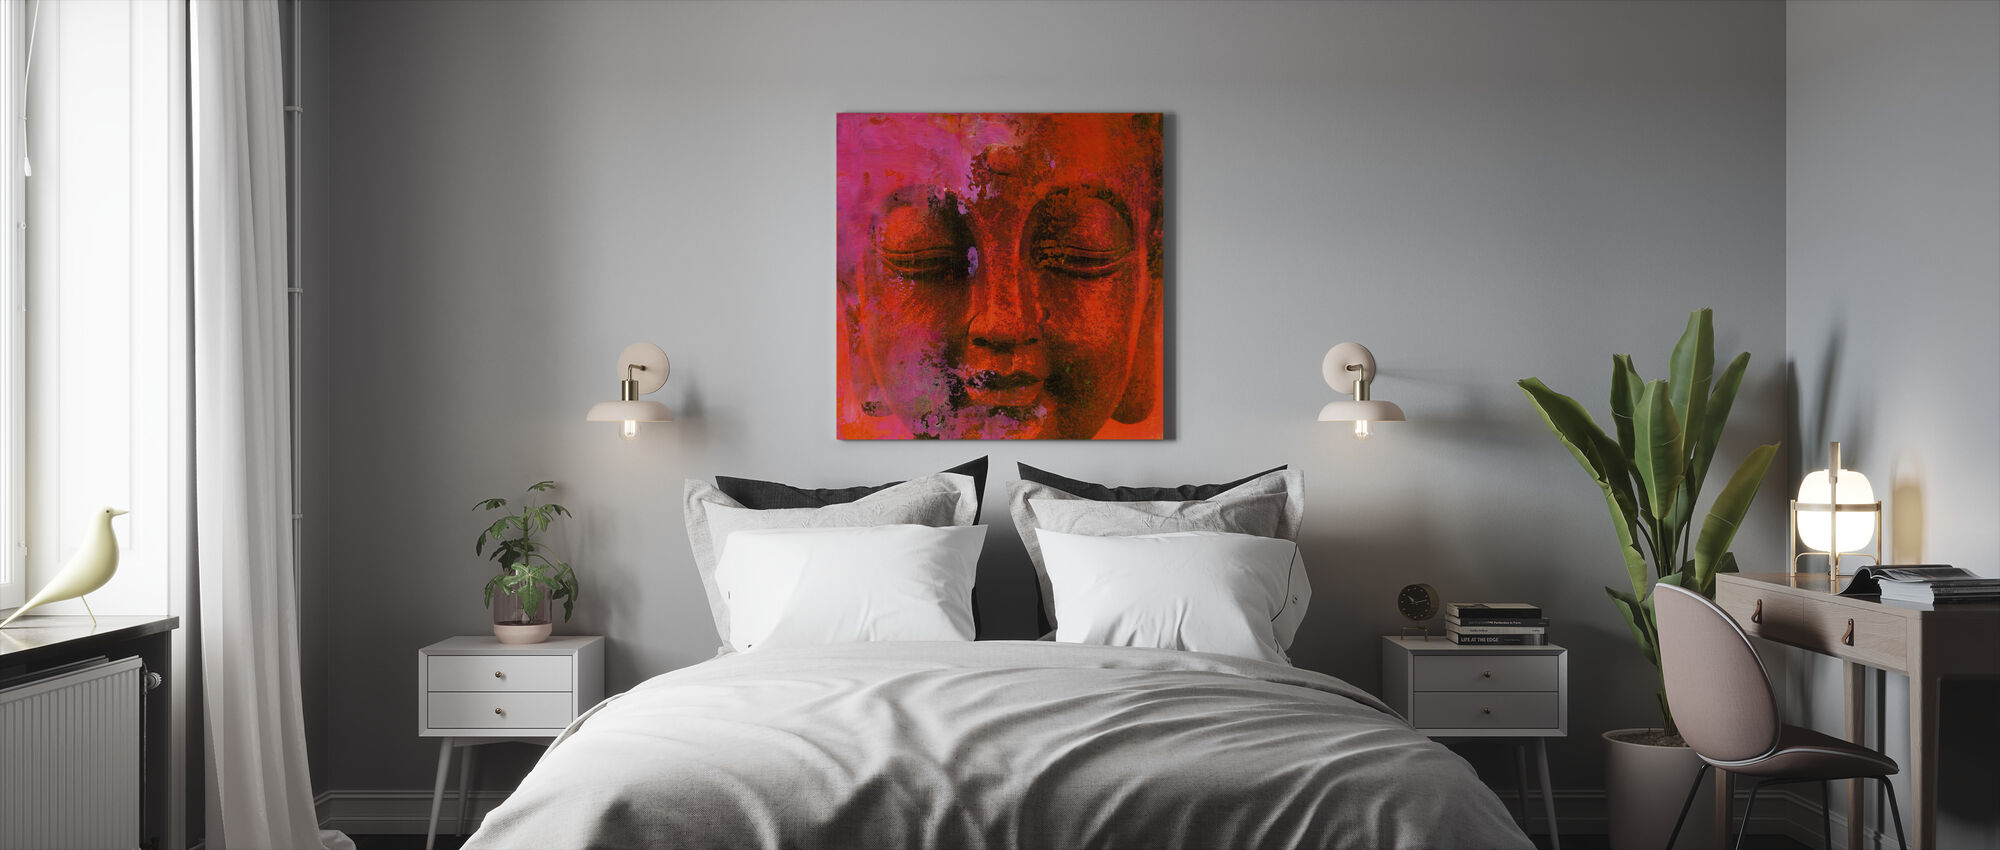 Red Buddha - Canvas print - Bedroom